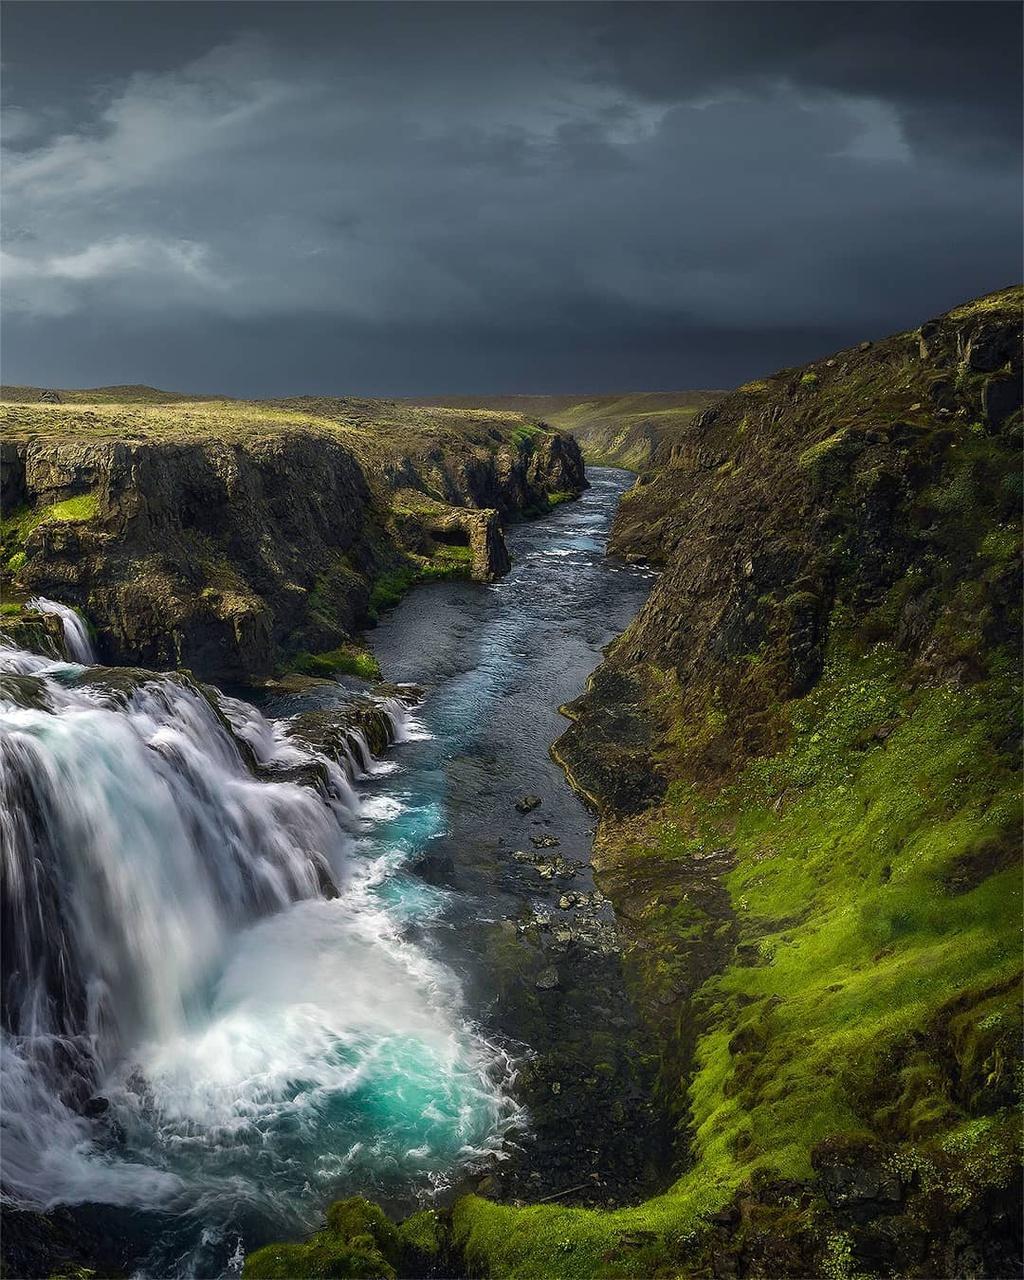 nhung-mien-dat-mau-xanh-o-Iceland-ivivu-13